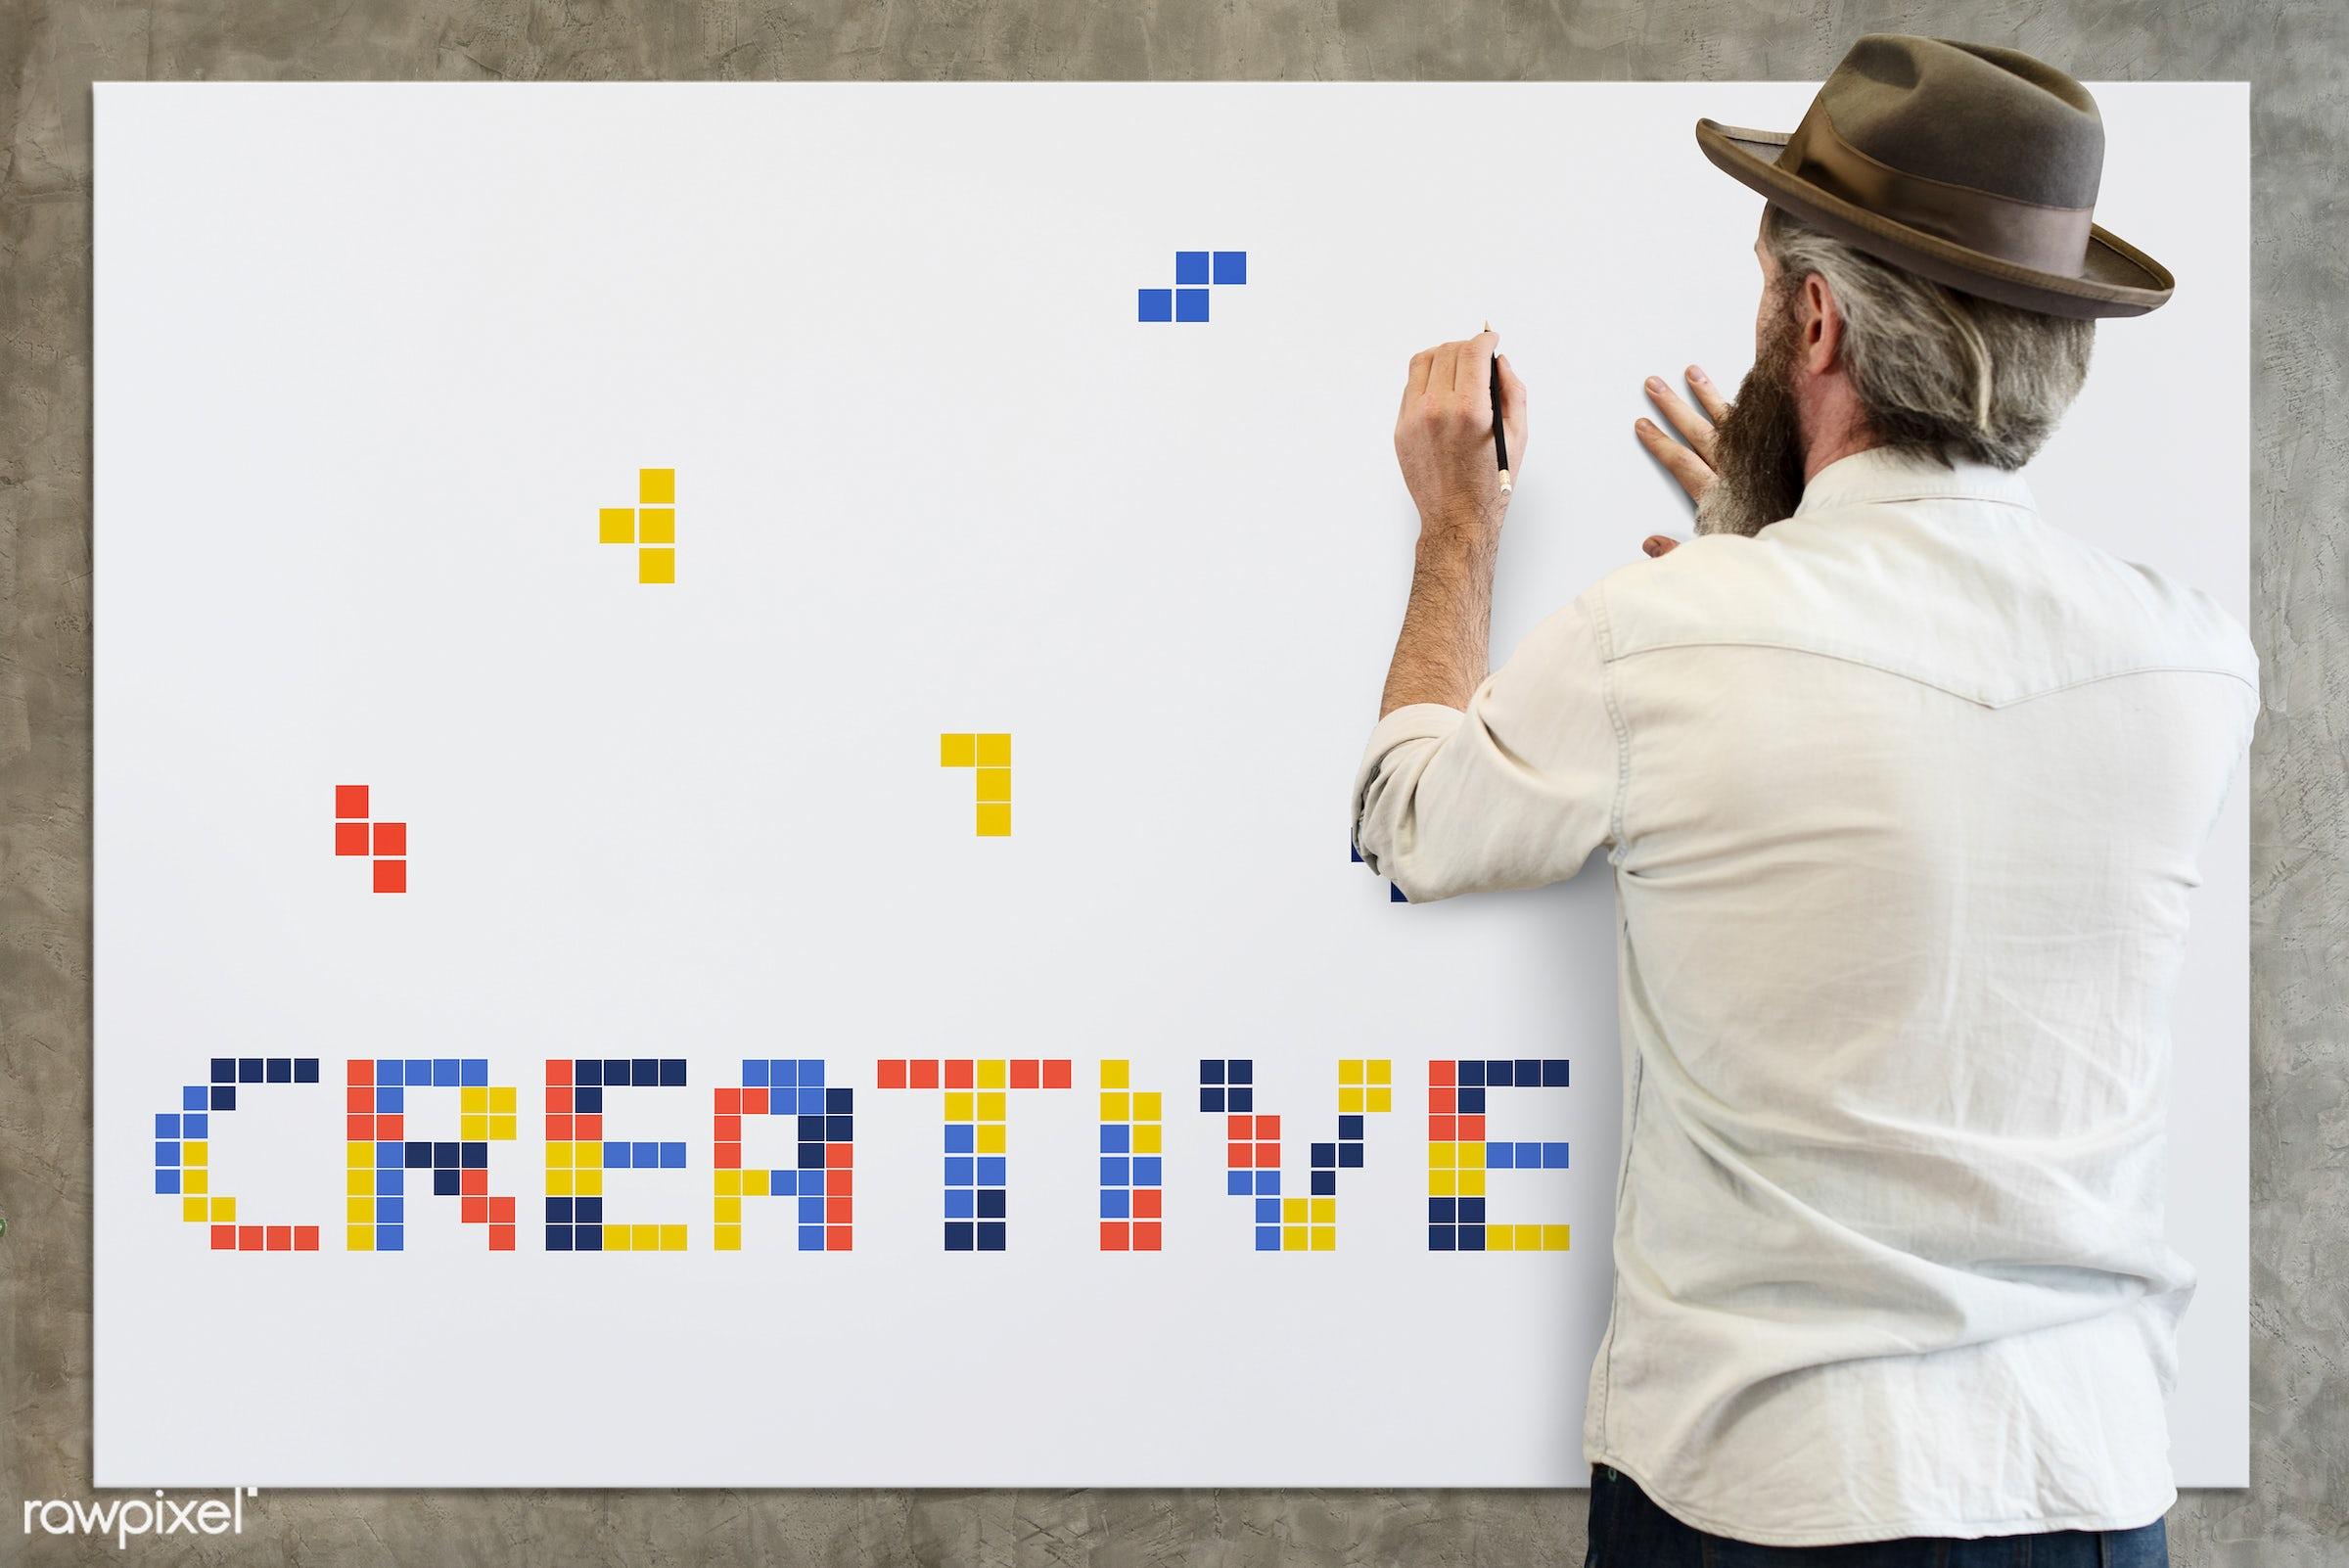 8 bit, adult, alone, art, artistry, back, be creative, beard, beard guy, block, board, carefree, casual, chill, create,...